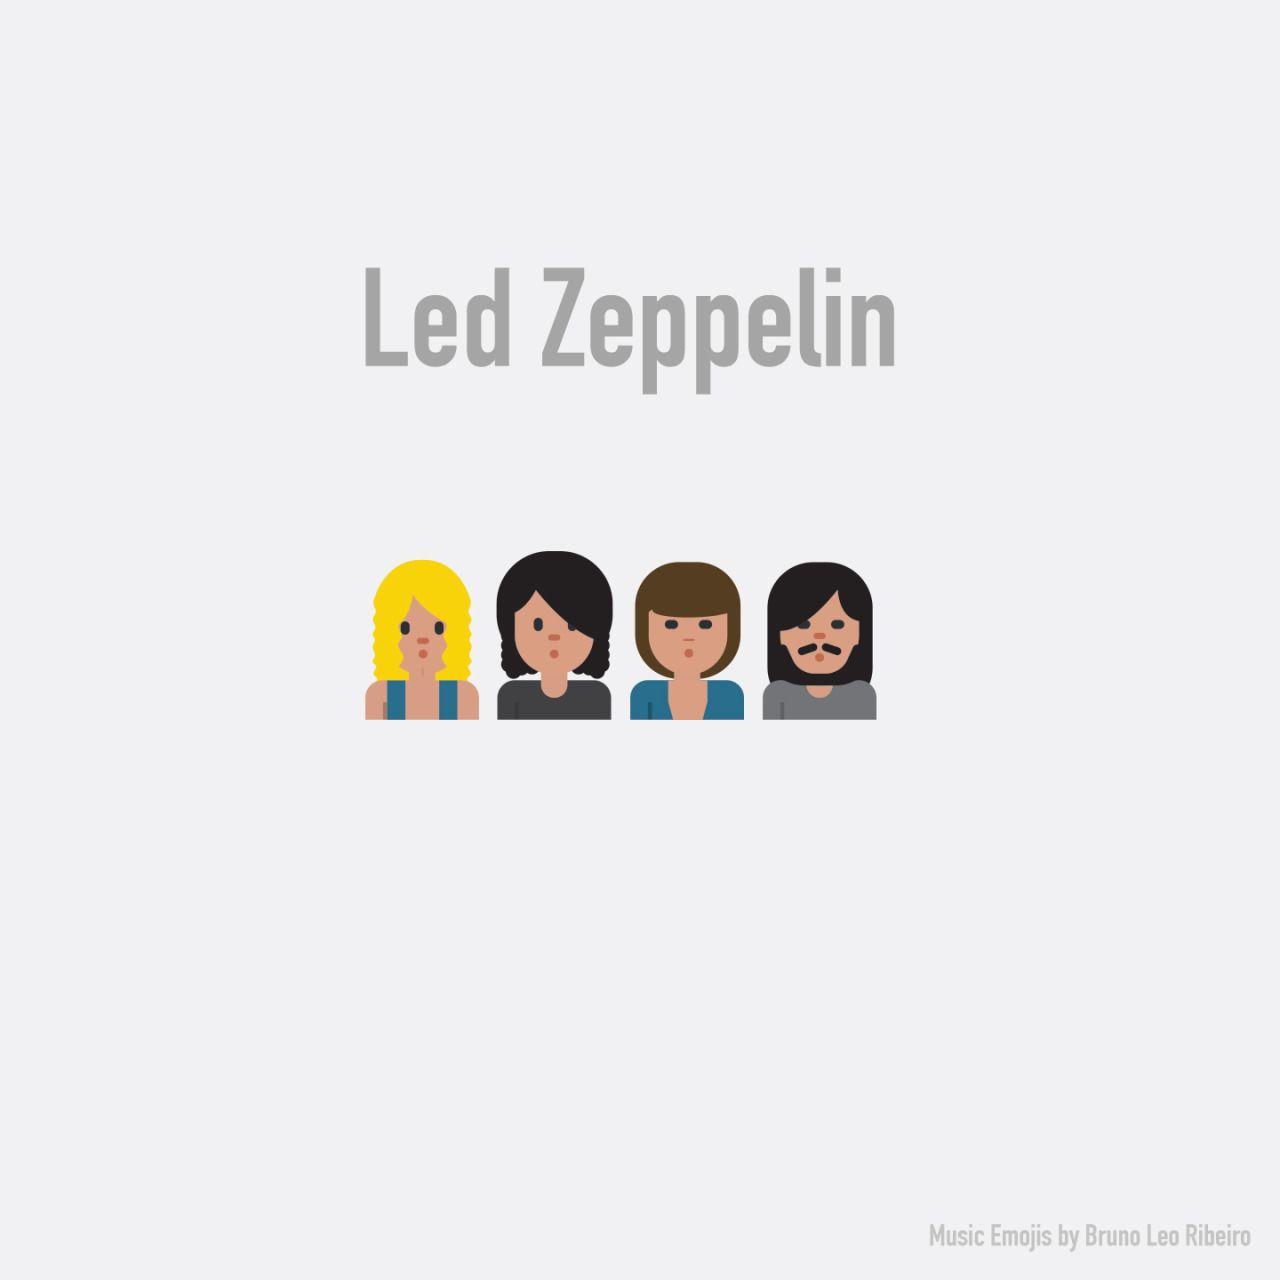 Fantastic Wallpaper Music Emoji - 4aabf4dc9c2570d32242a7334f720da9  2018_76818.jpg